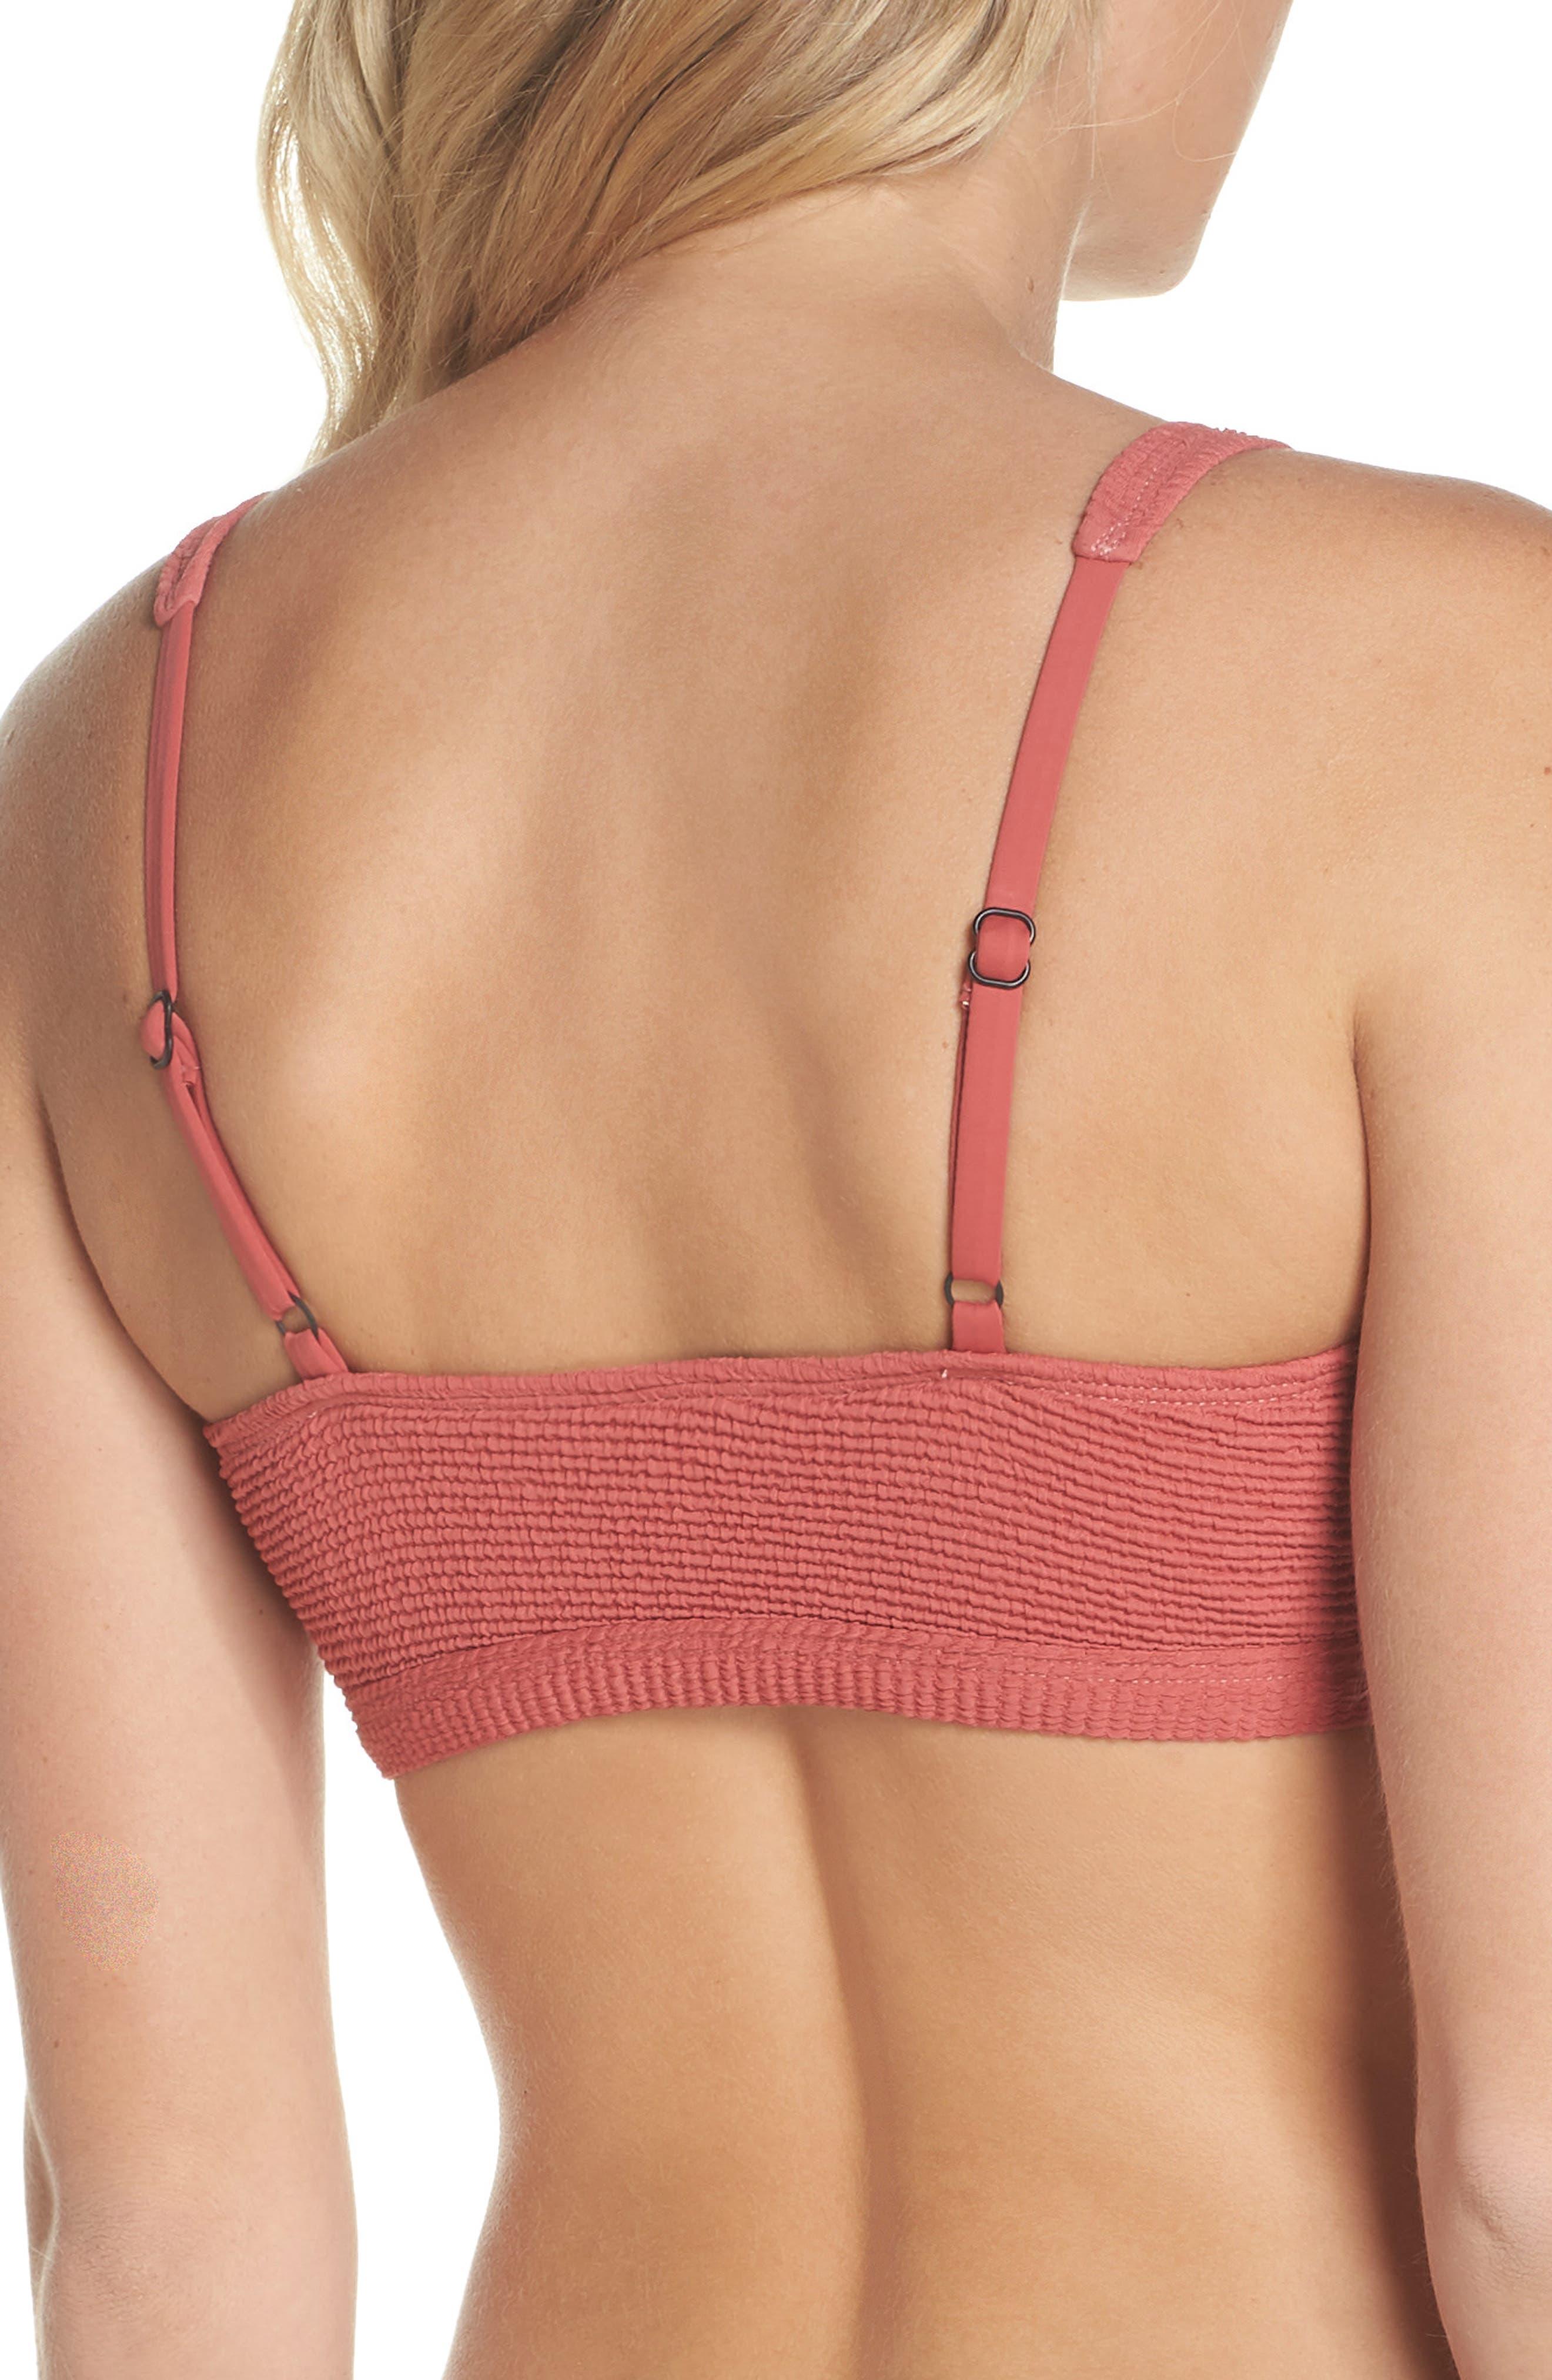 Malibu Bikini Top,                             Alternate thumbnail 2, color,                             RED MINERAL